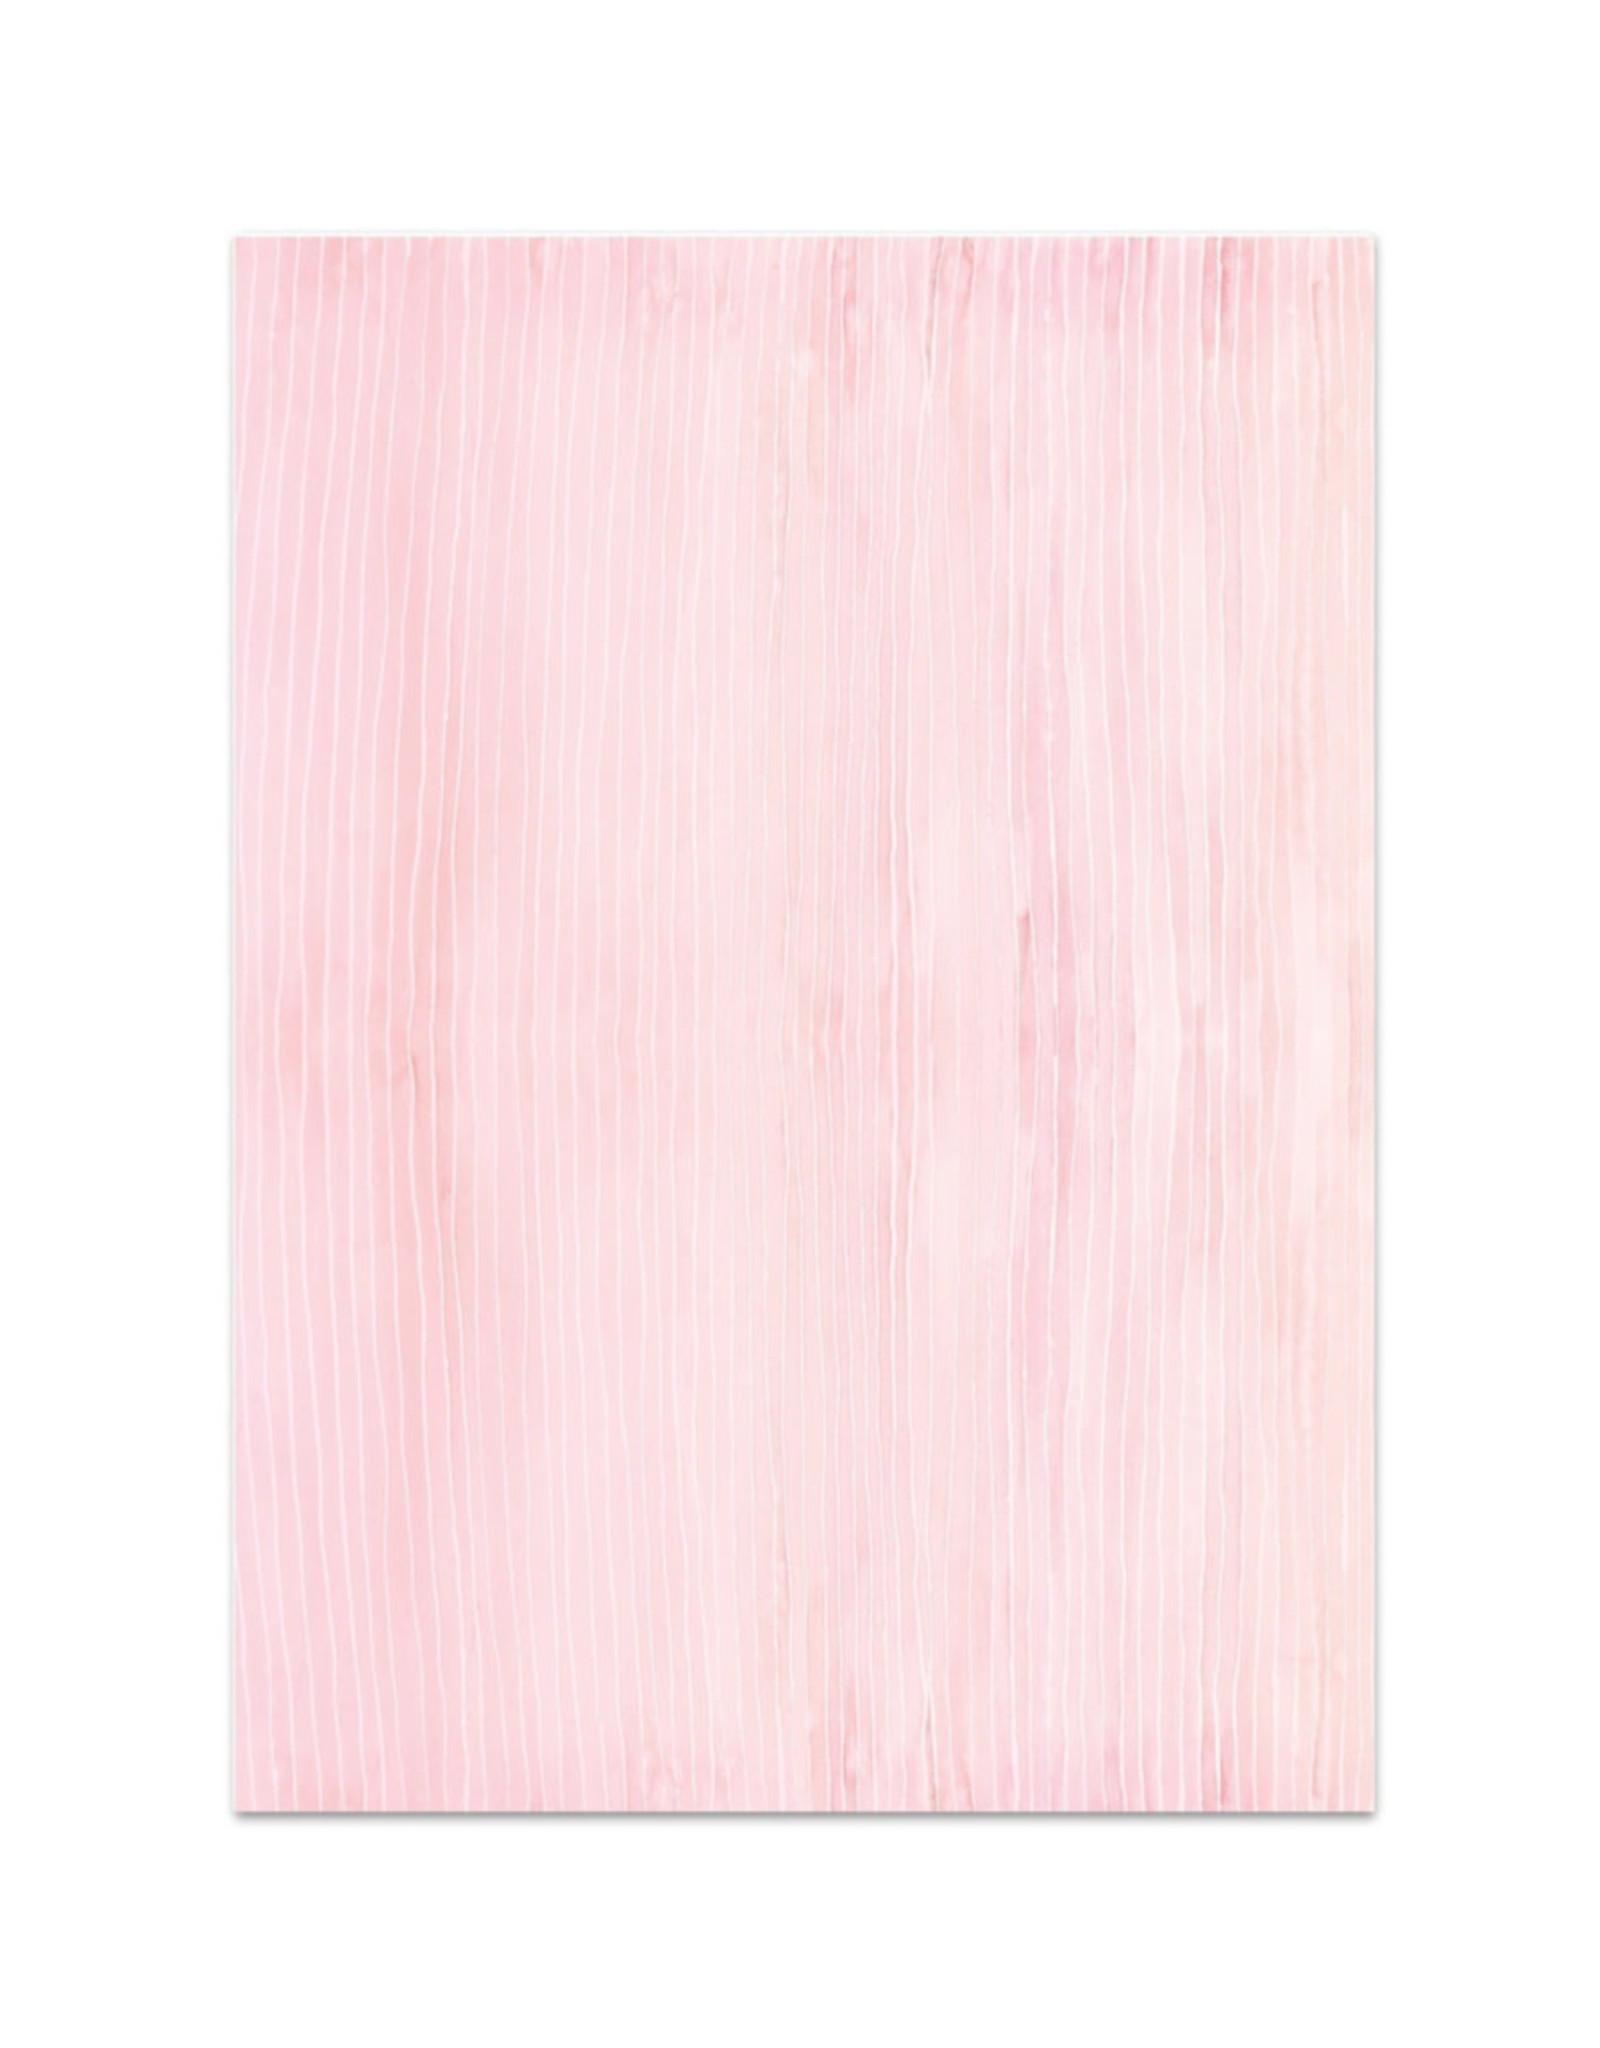 Leo La Douce Inpakpapier Roos met strepen - 2 Sheets 50 x70cm